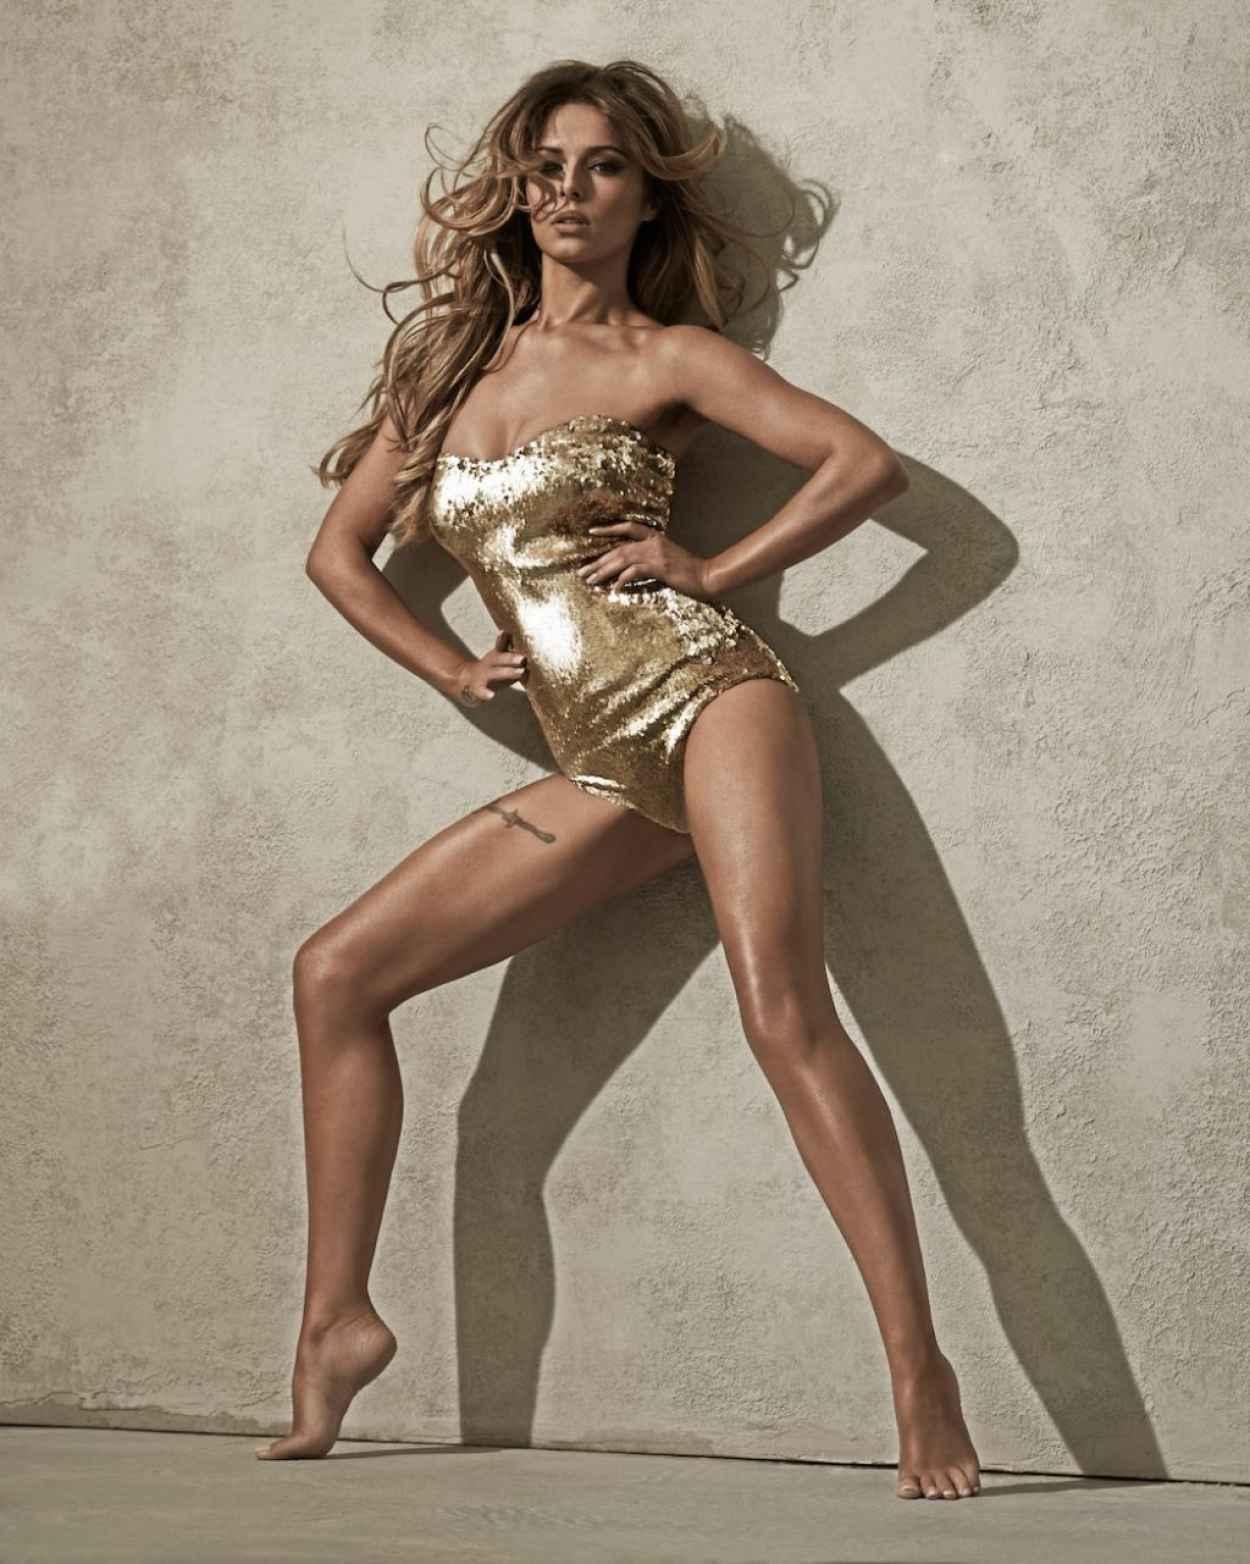 Cheryl Cole Photoshoot (2014)-1